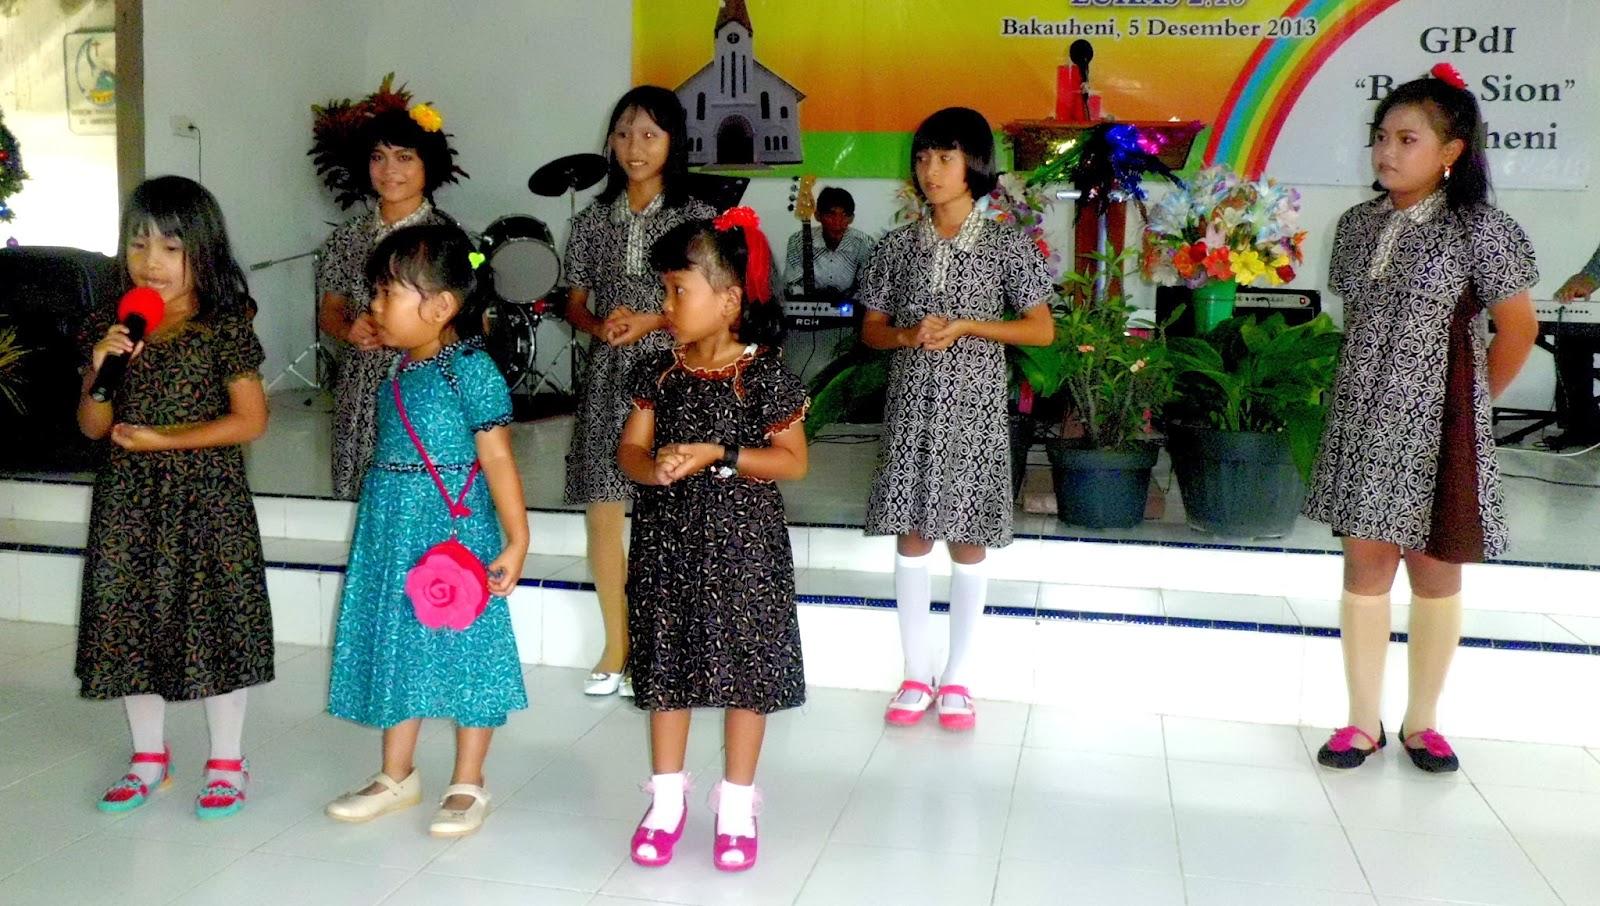 Persembahan tarian dan lagu dari anak Sekolah Minggu